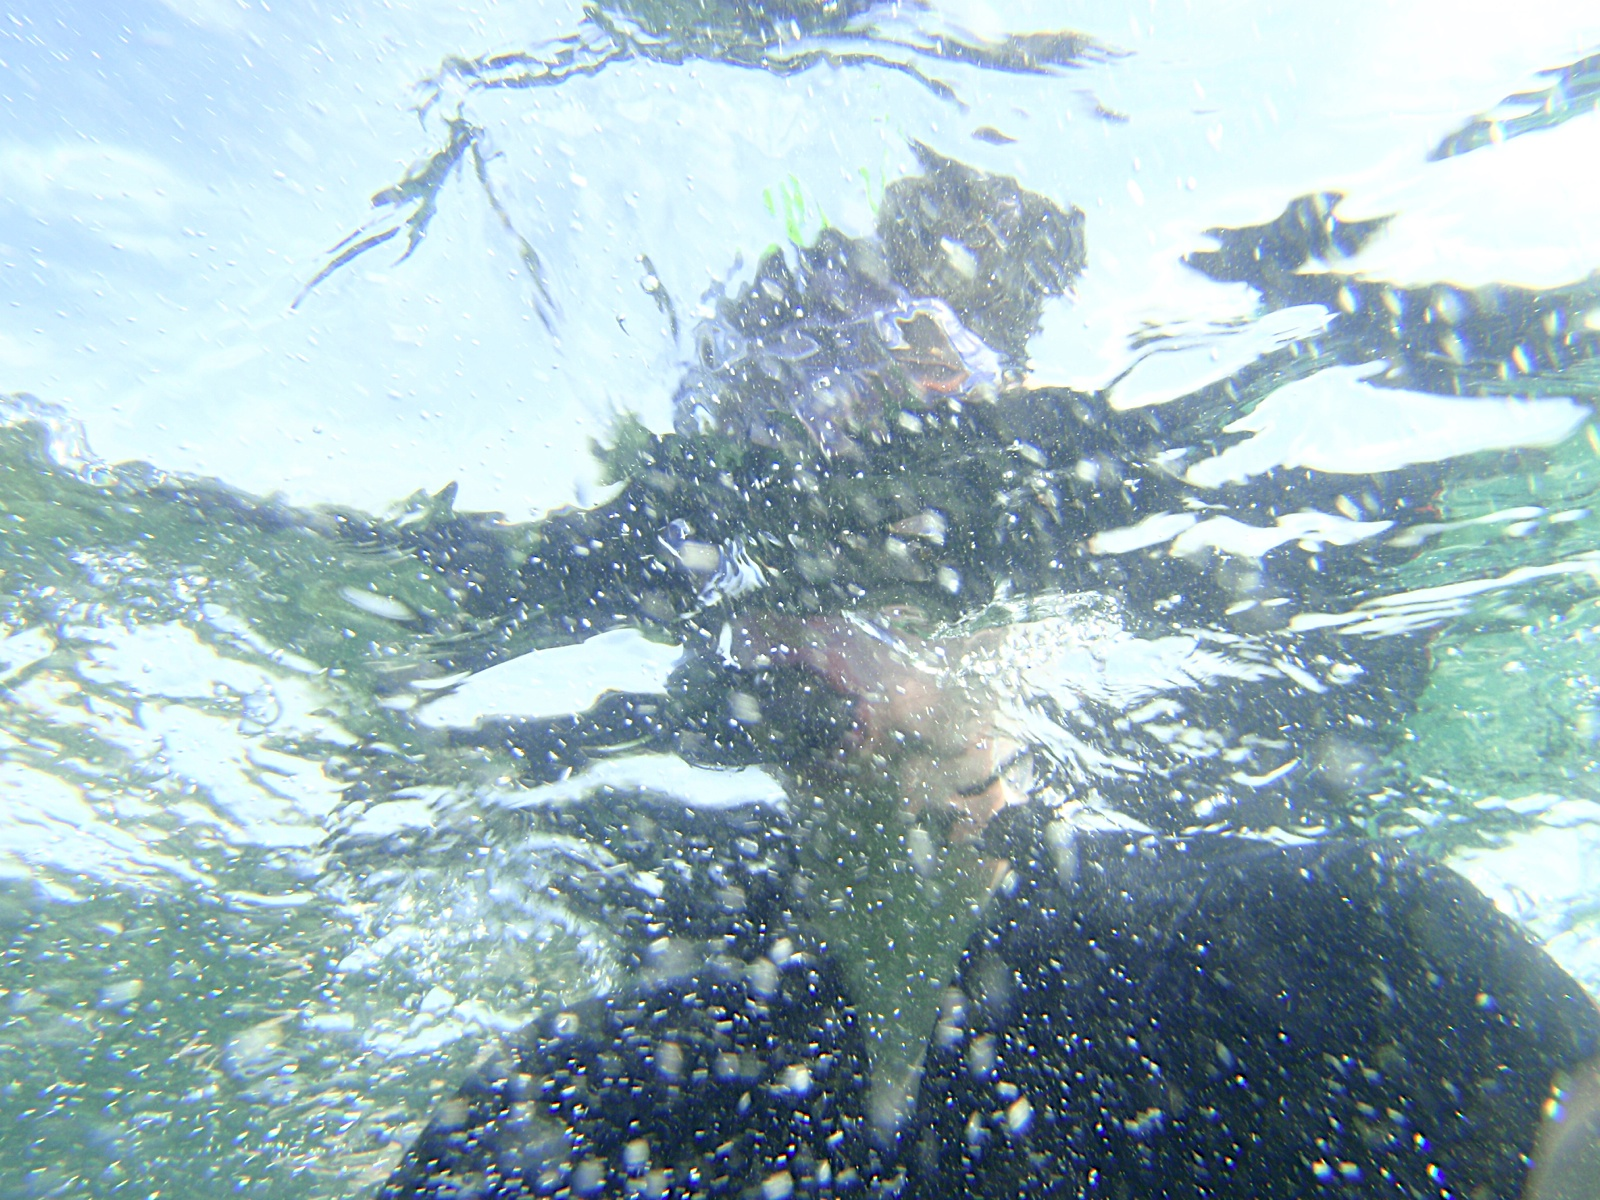 Monogràfic Marí 2010 - P5300341.JPG